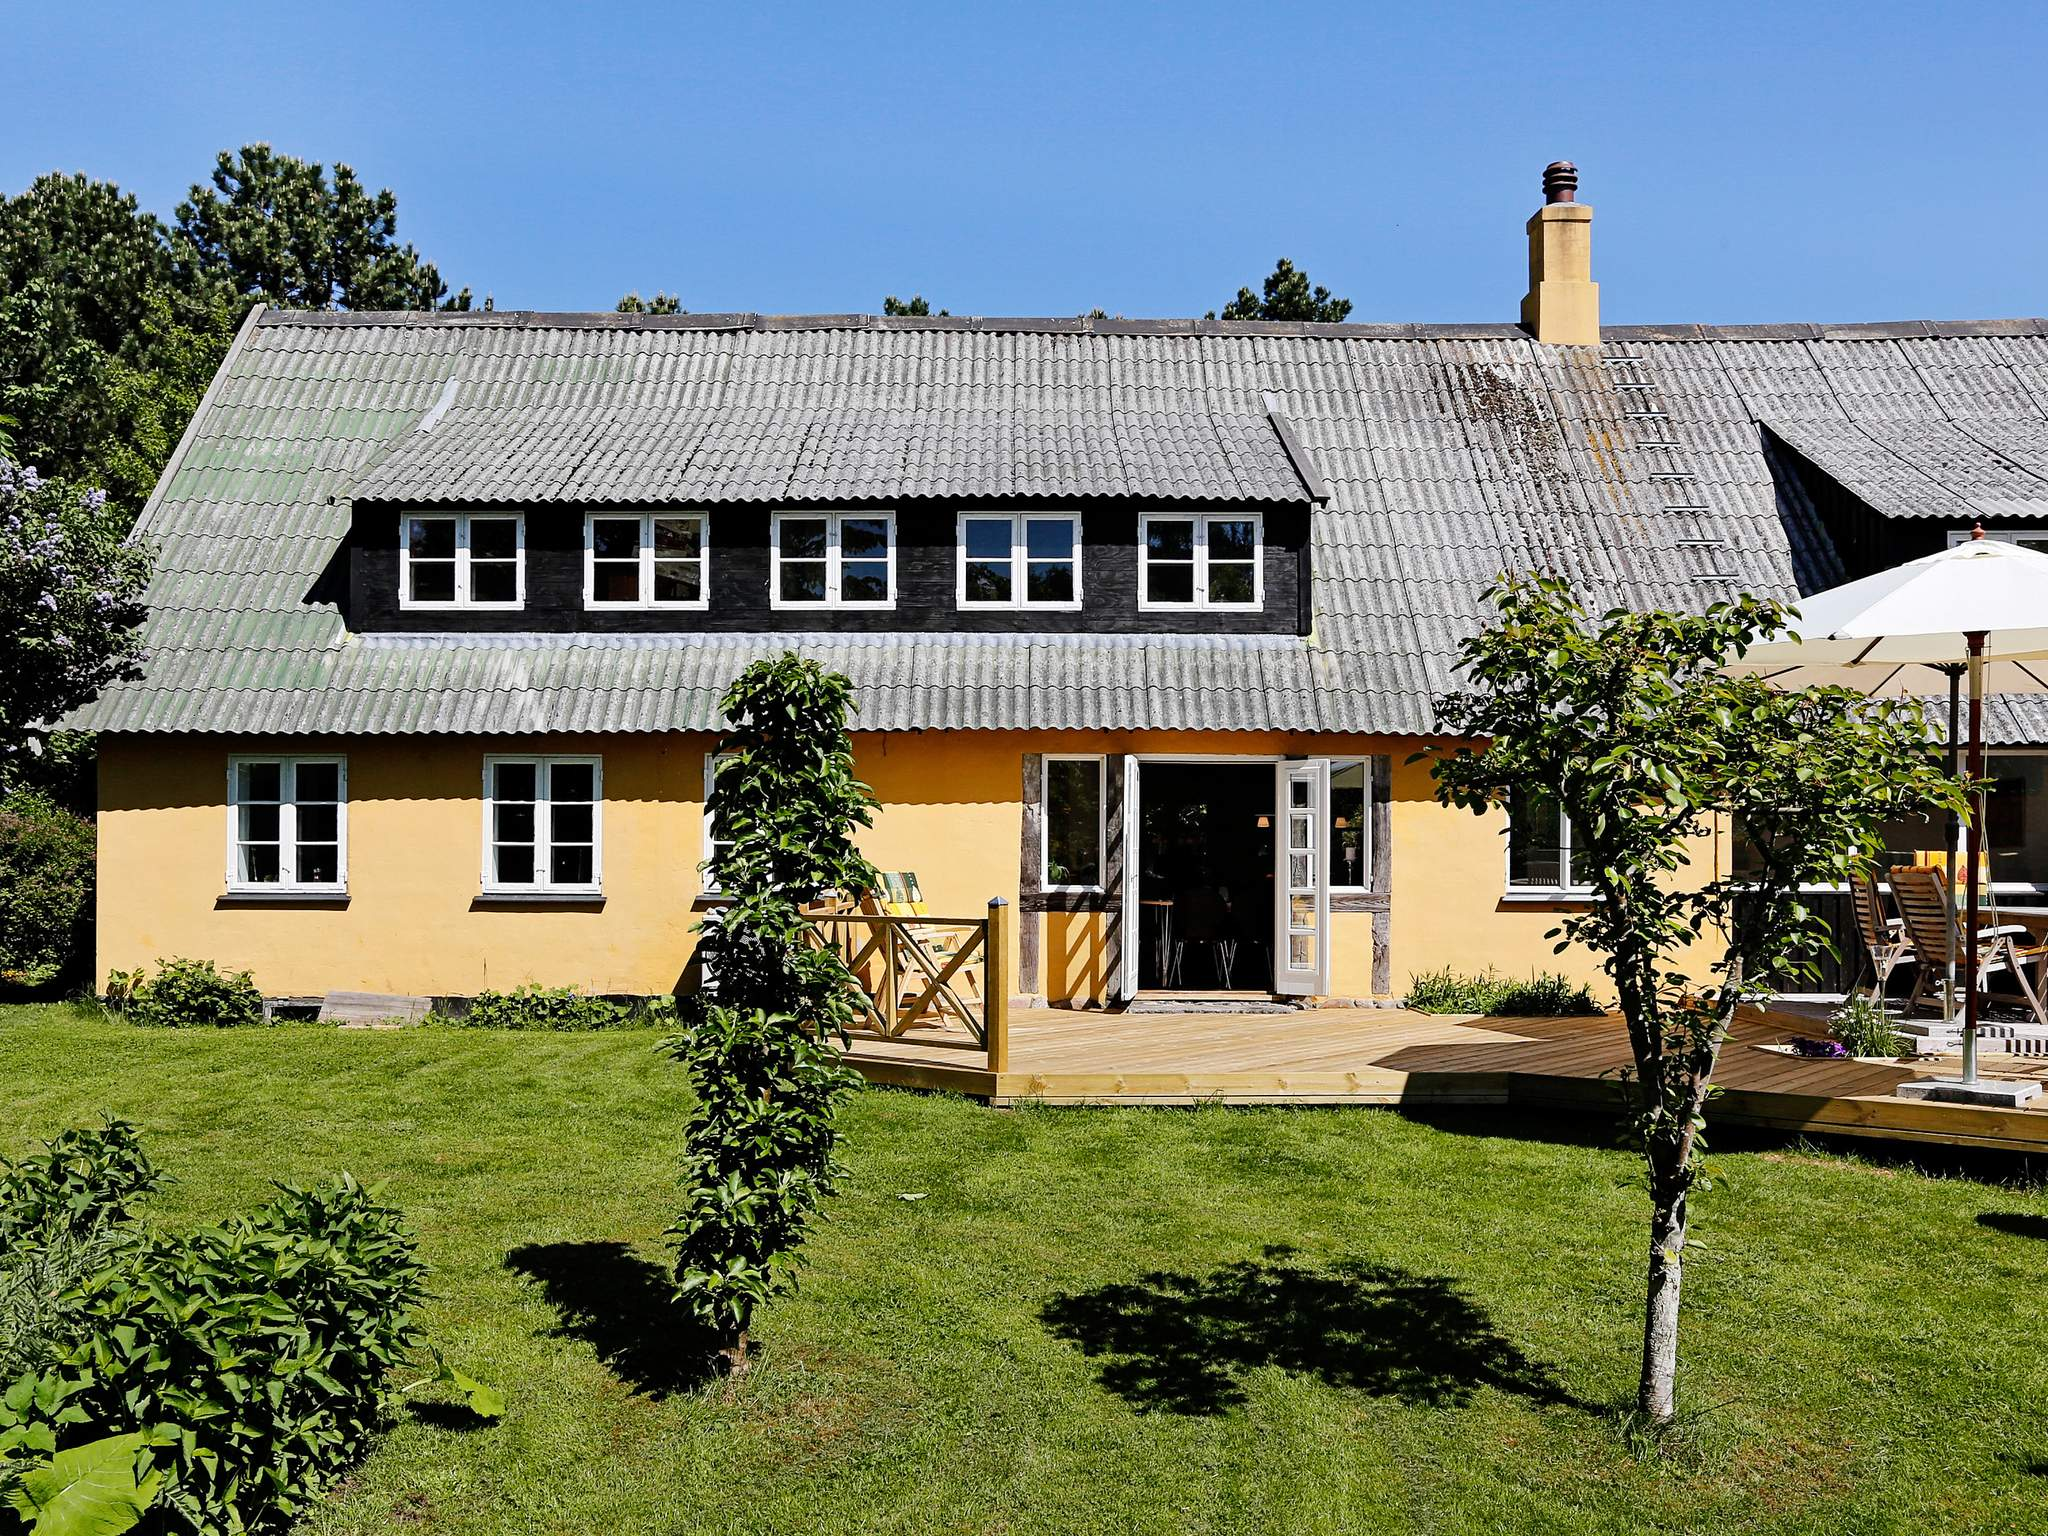 Ferienhaus Vejby Strand (771891), Vejby, , Nordseeland, Dänemark, Bild 1